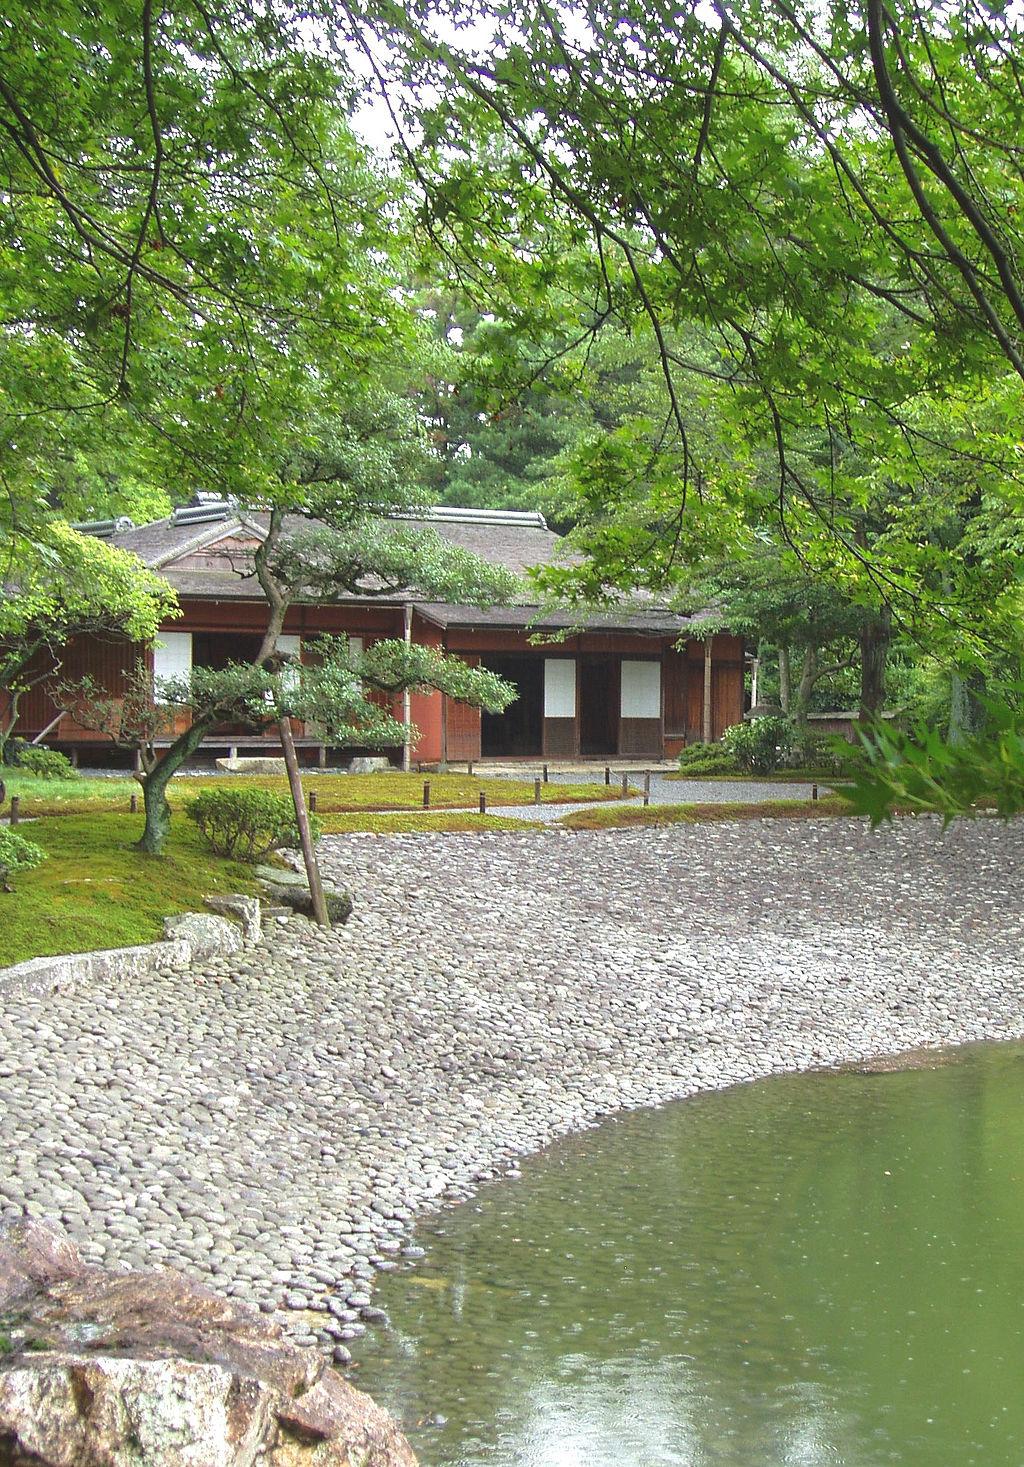 Figure 2: Suhama at Omiya Imperial Palace, Kyoto